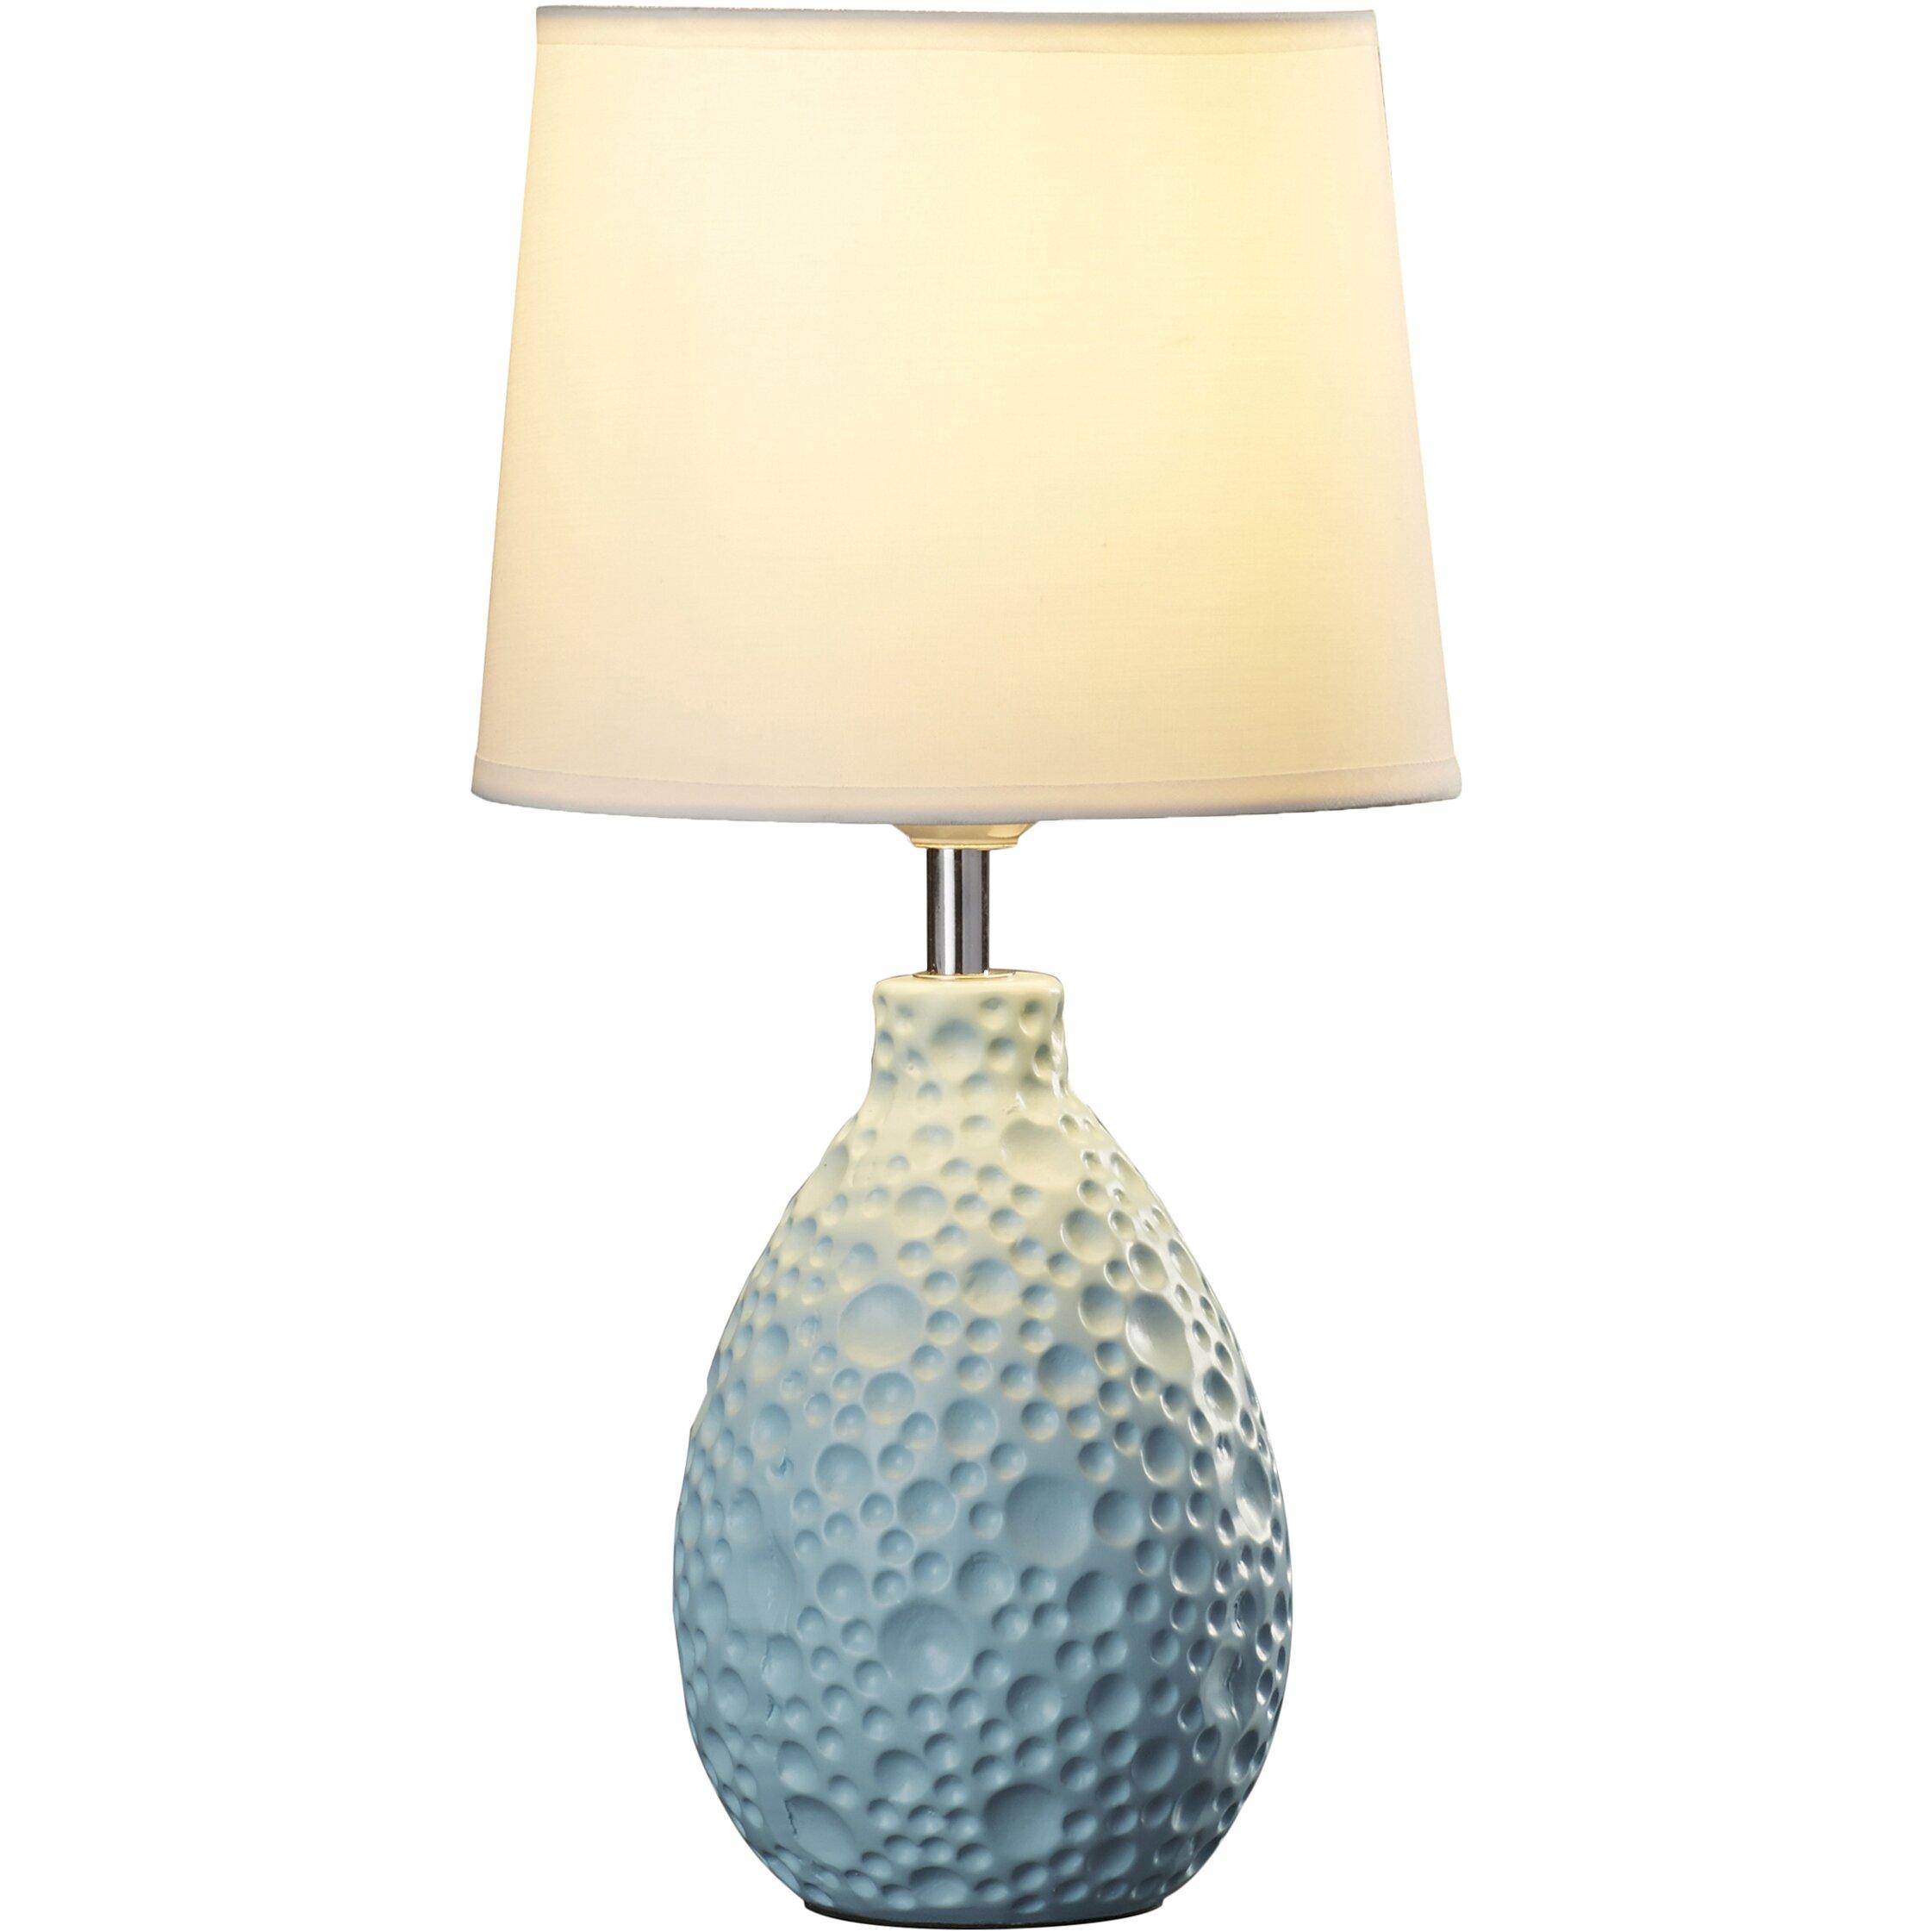 beachcrest home tierra verde oval ceramic h table. Black Bedroom Furniture Sets. Home Design Ideas